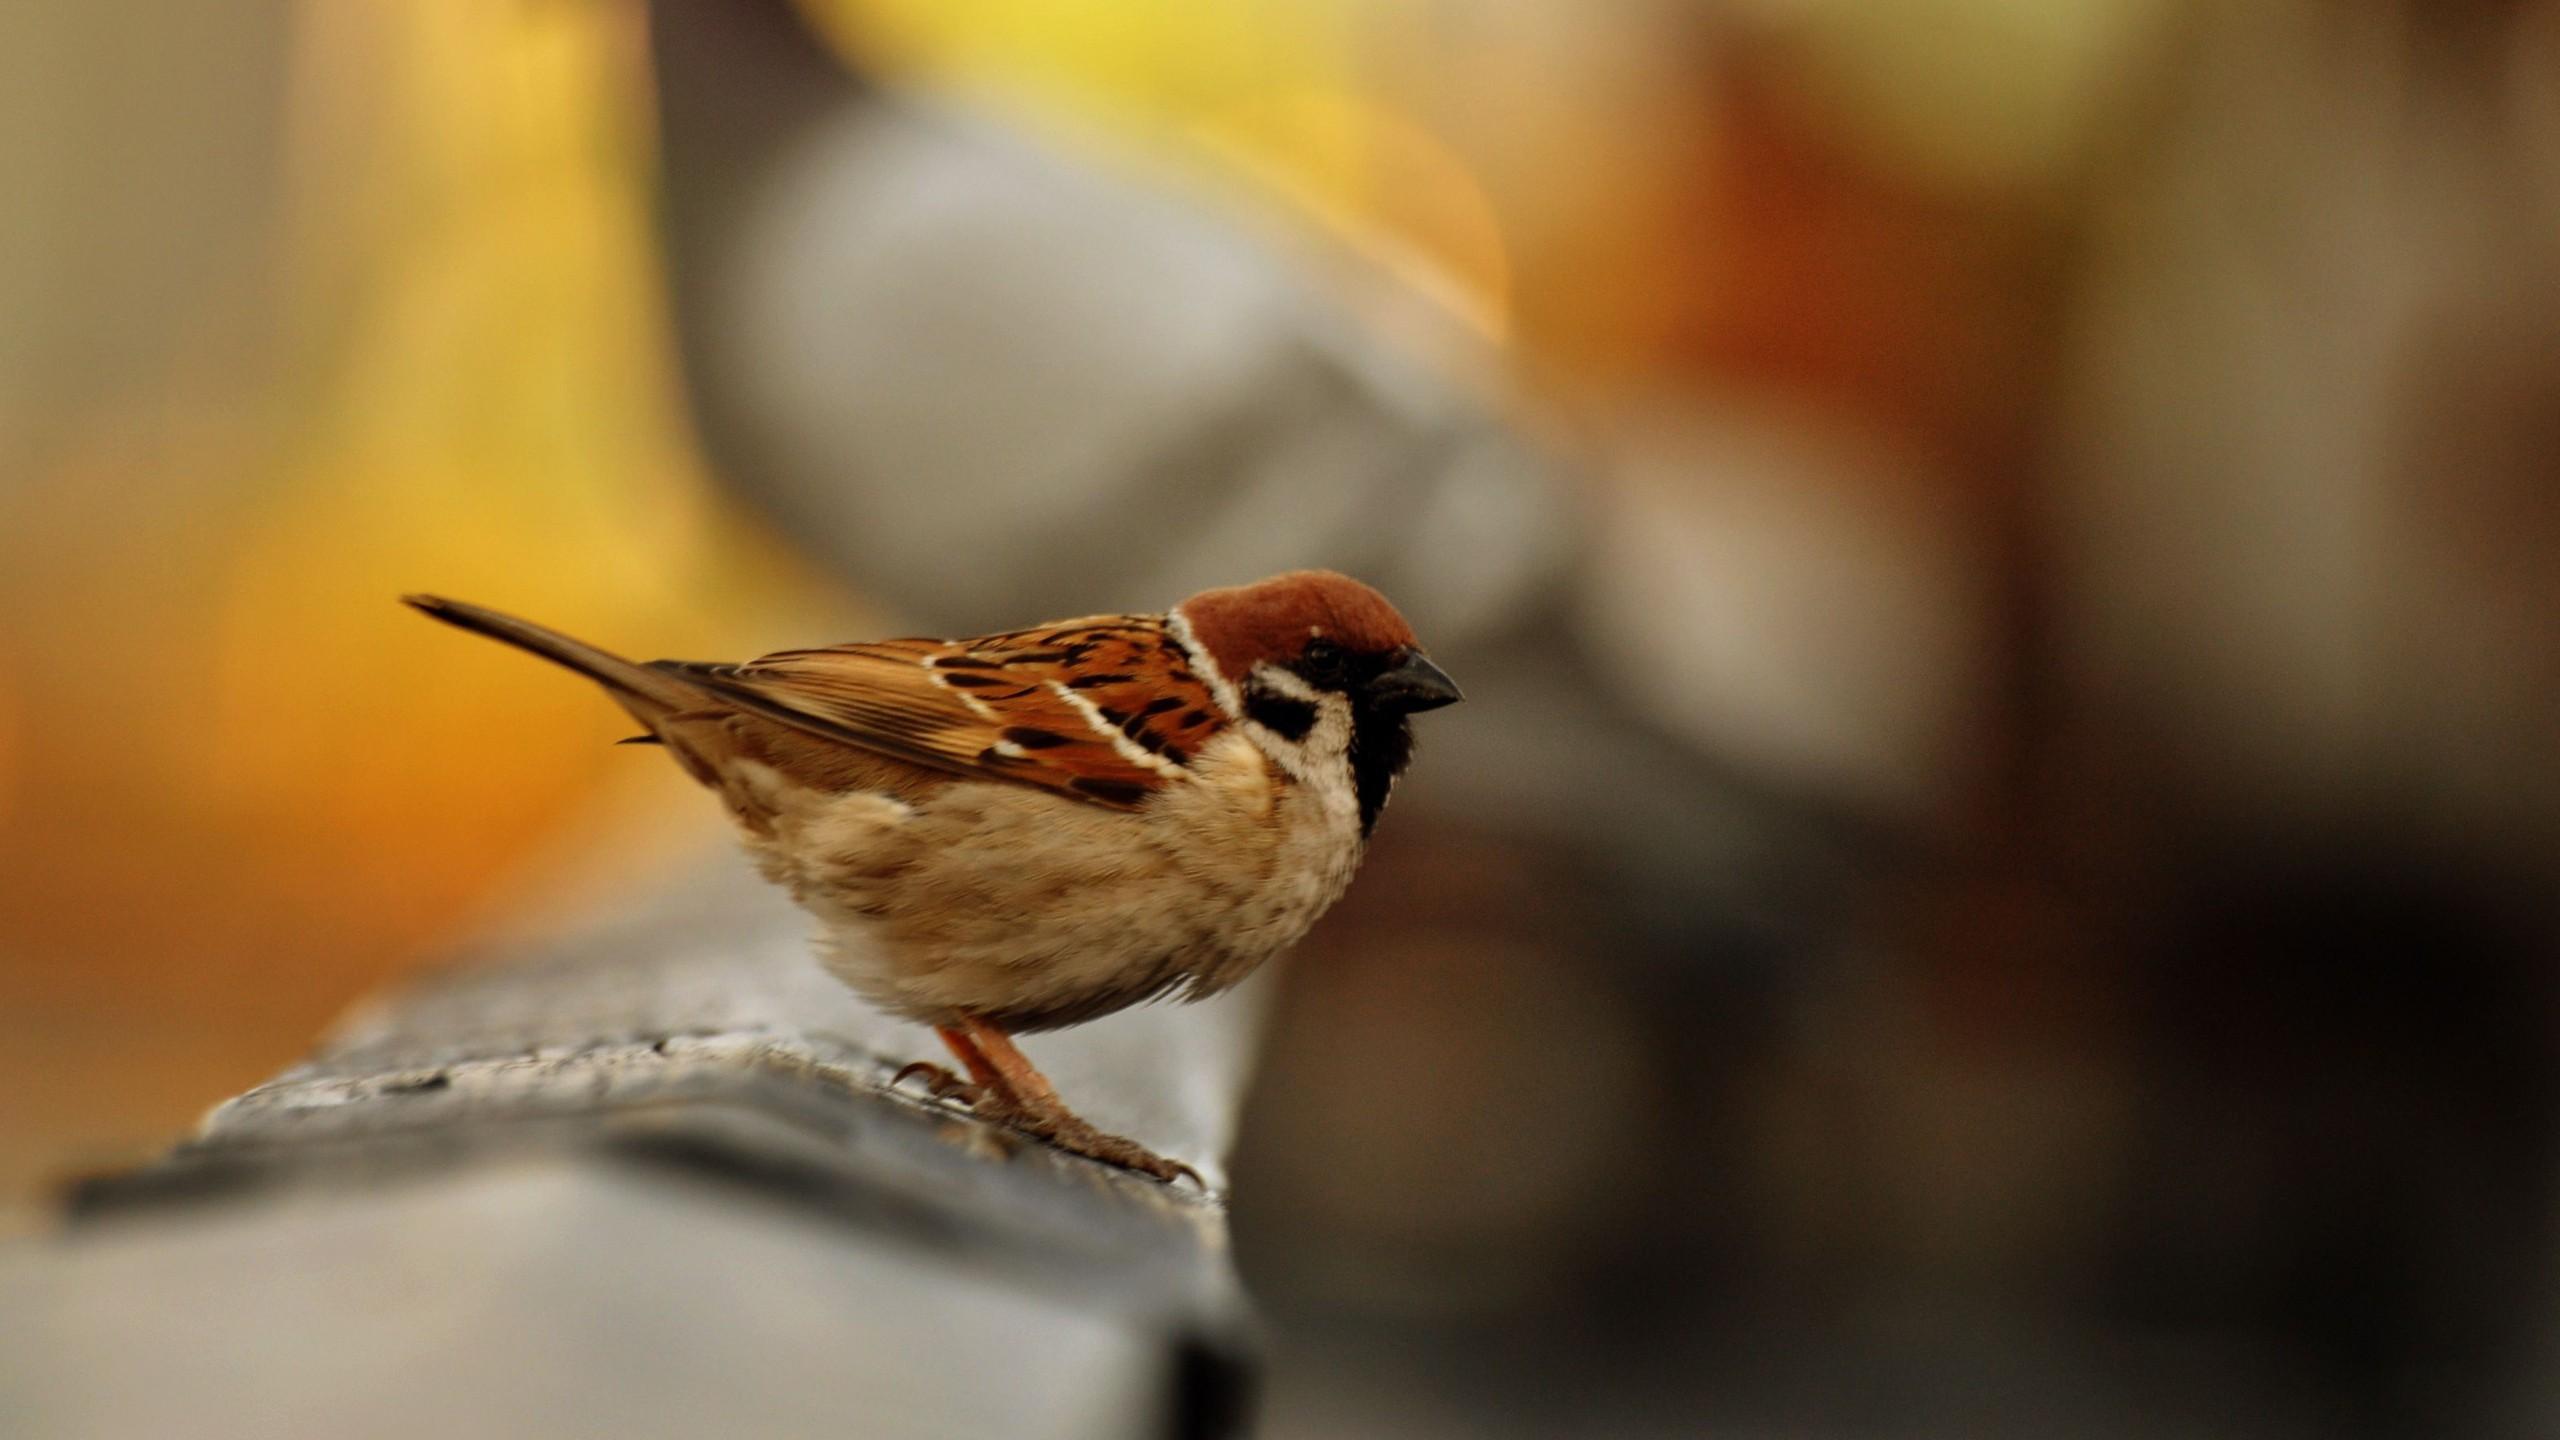 Bird Santa Banta Desktop HD Wallpaper 2560x1440